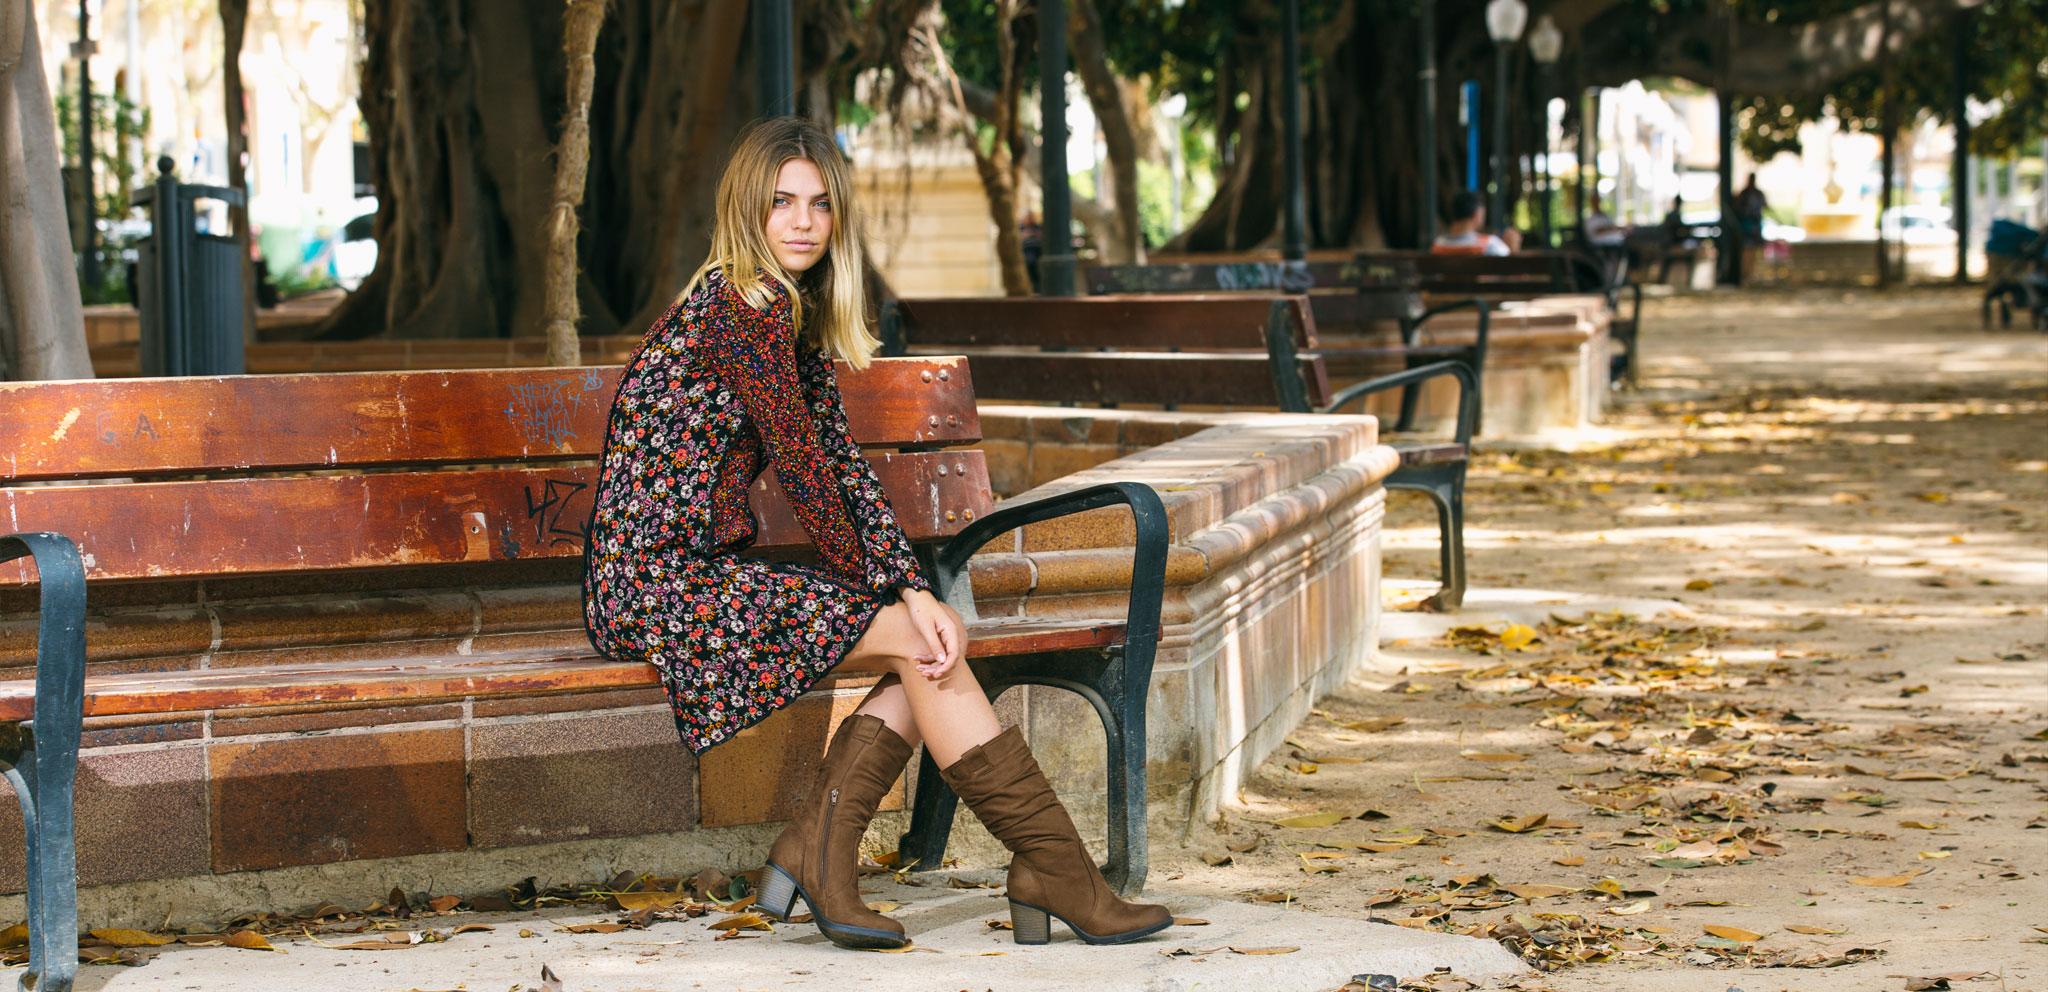 Isteria Shoes Invierno 3